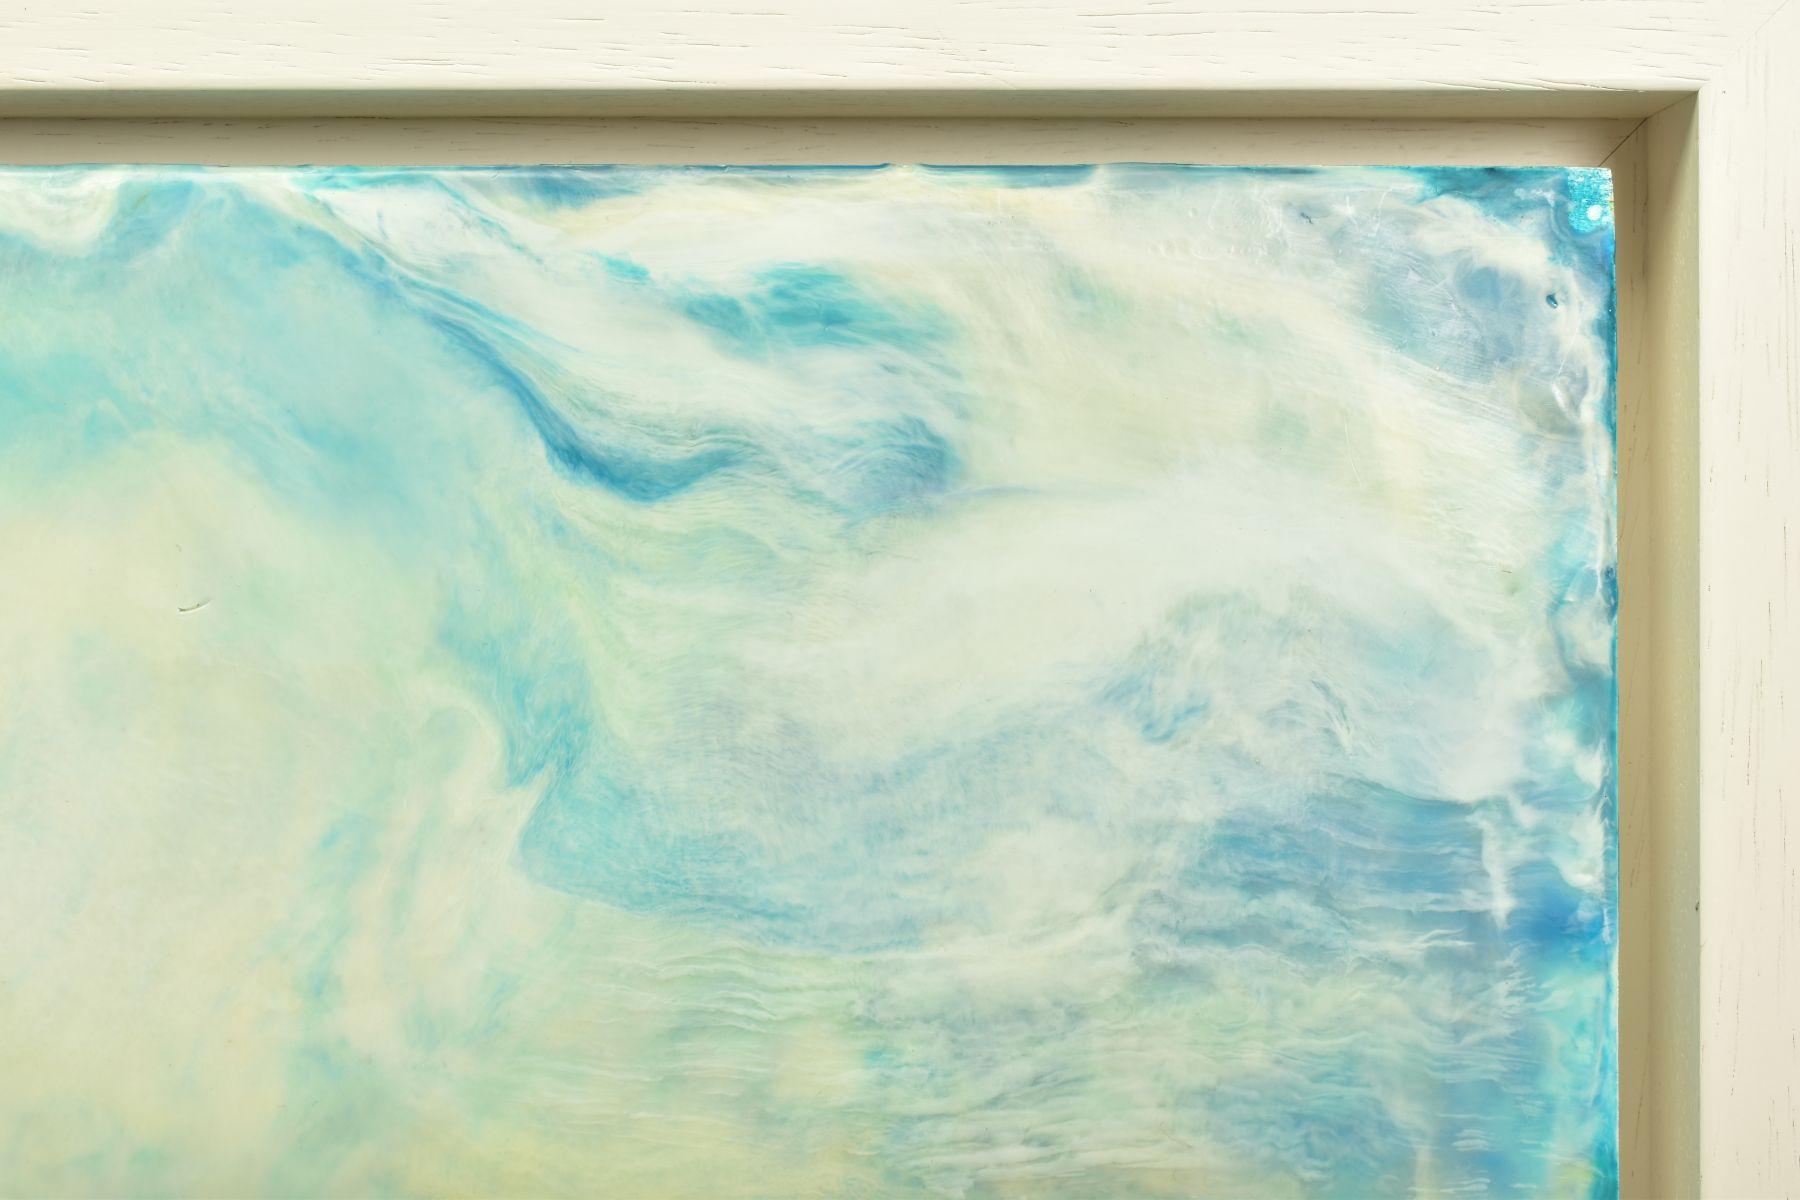 JENNINE PARKER (BRITISH 1971), 'Sea of Splendor', a coastal seascape, initialled bottom right, mixed - Image 4 of 7